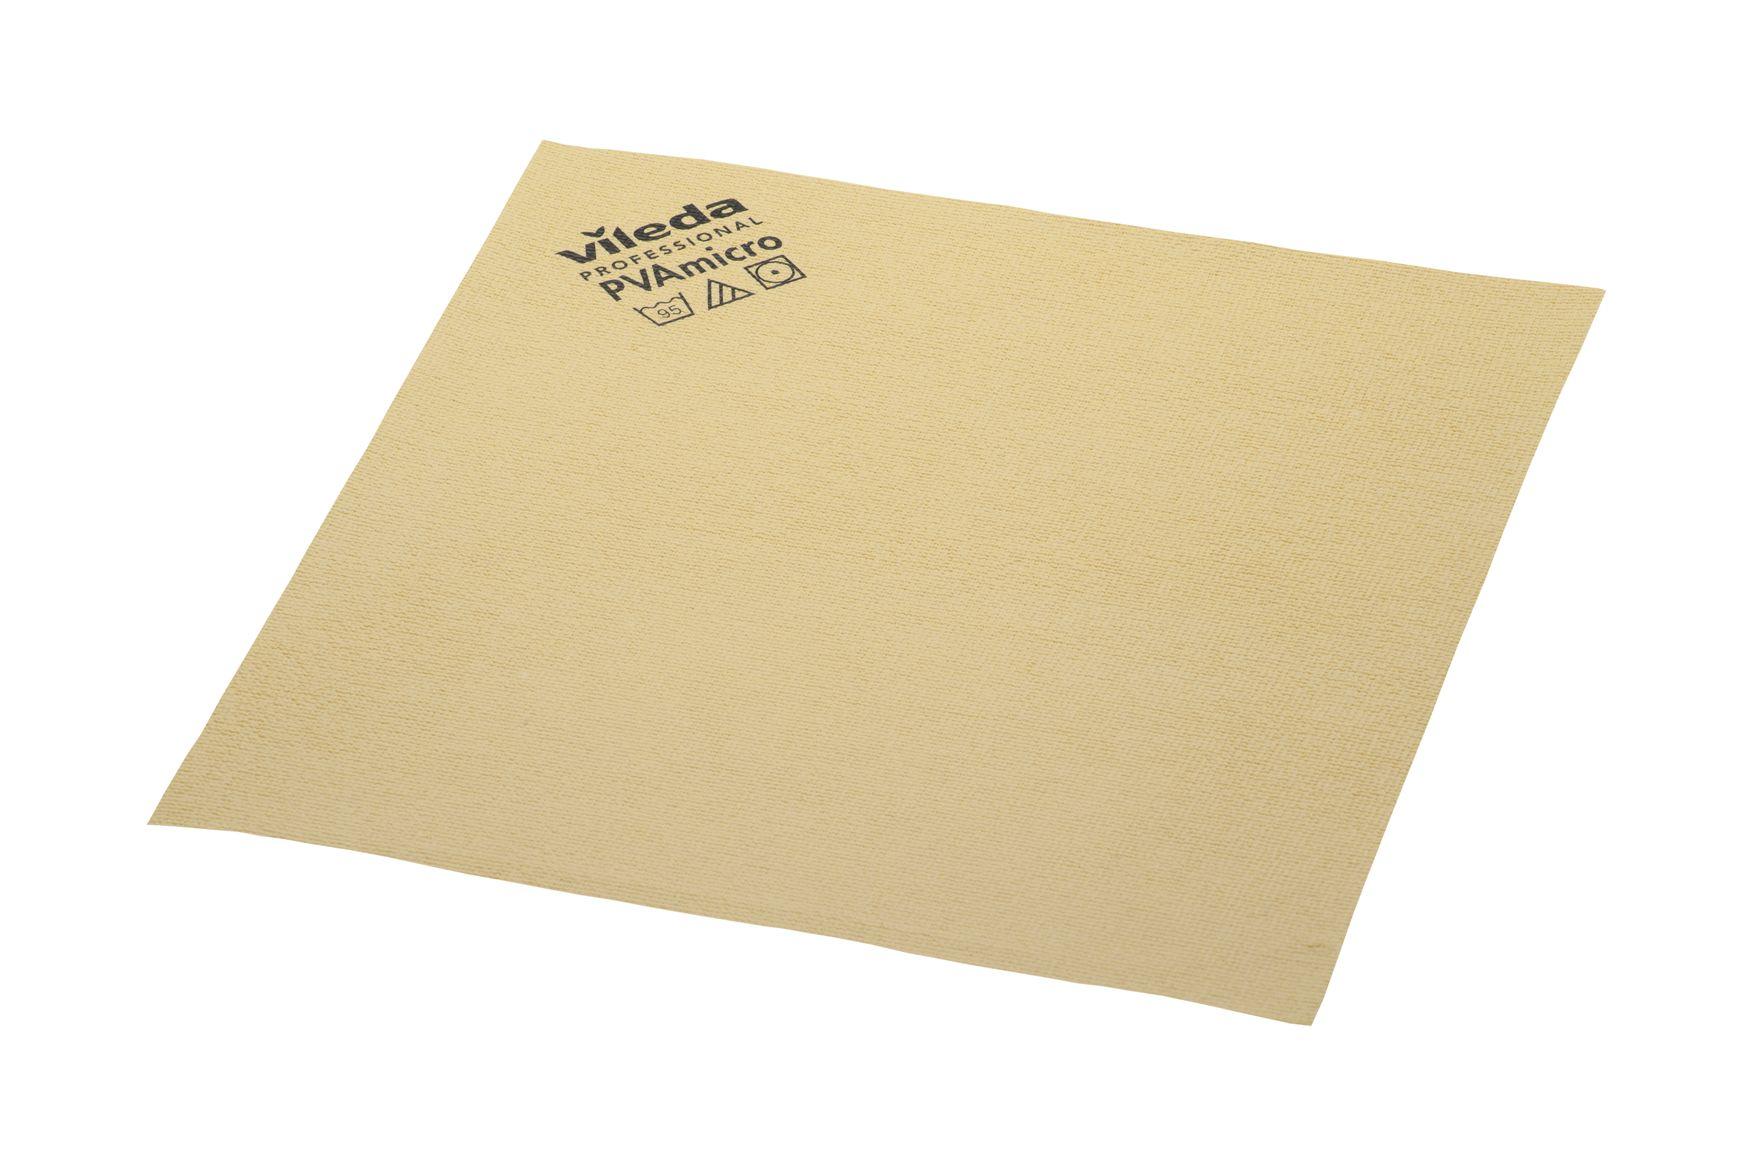 Vileda PVA Micro, 5 Stück/Packung, gelb, 38 x 35 cm